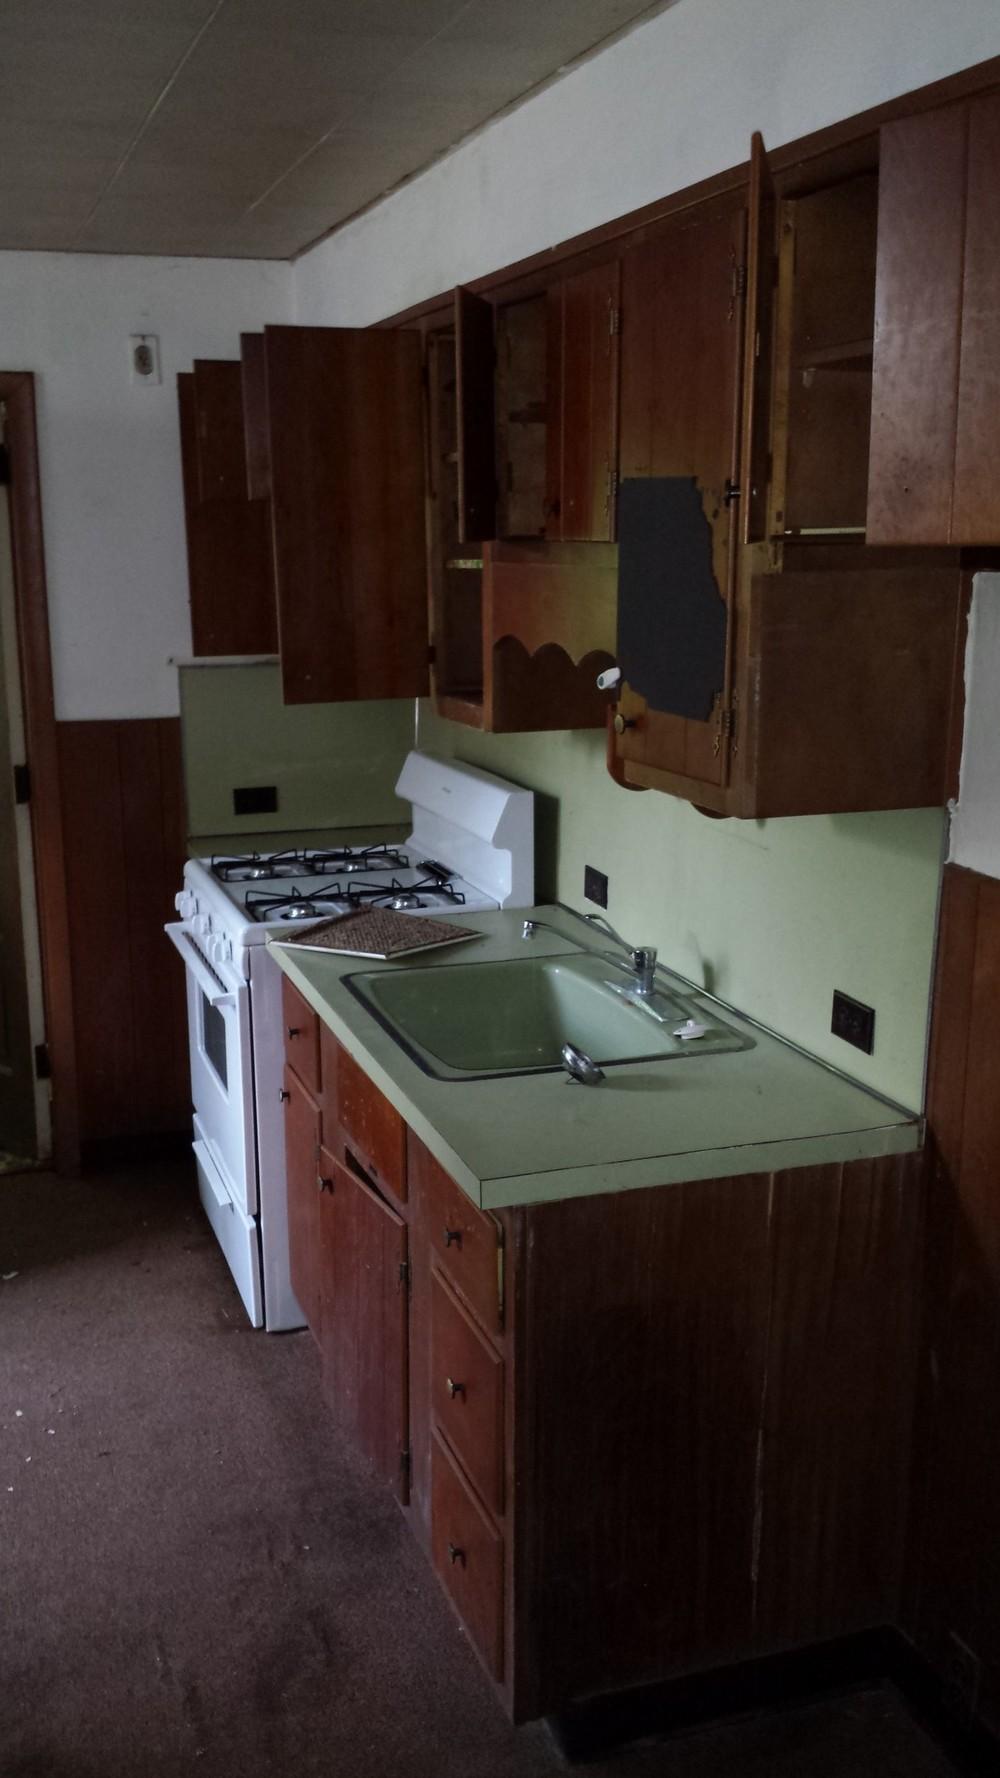 a4 - 3523 sunnyside exist kitchen 1.jpg